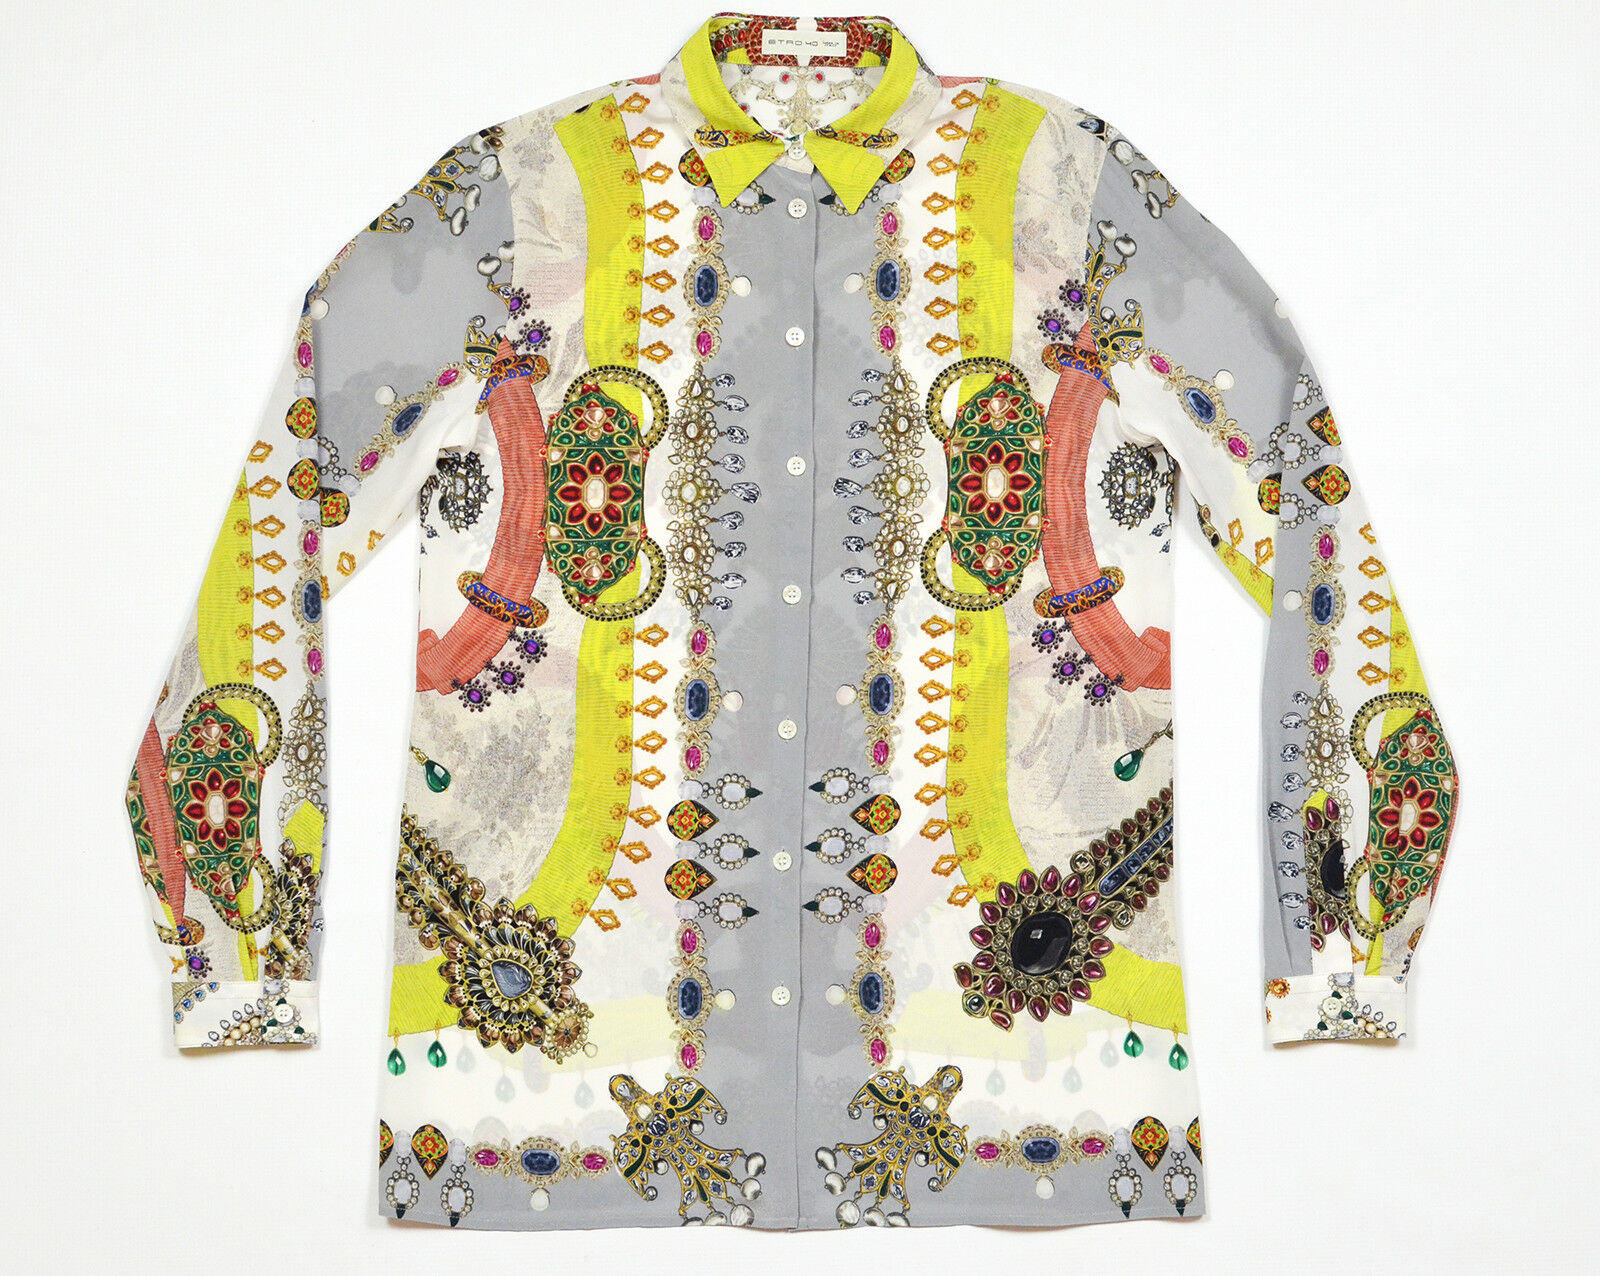 ETRO Silk Blouse Button Down Shirt Top IT 40